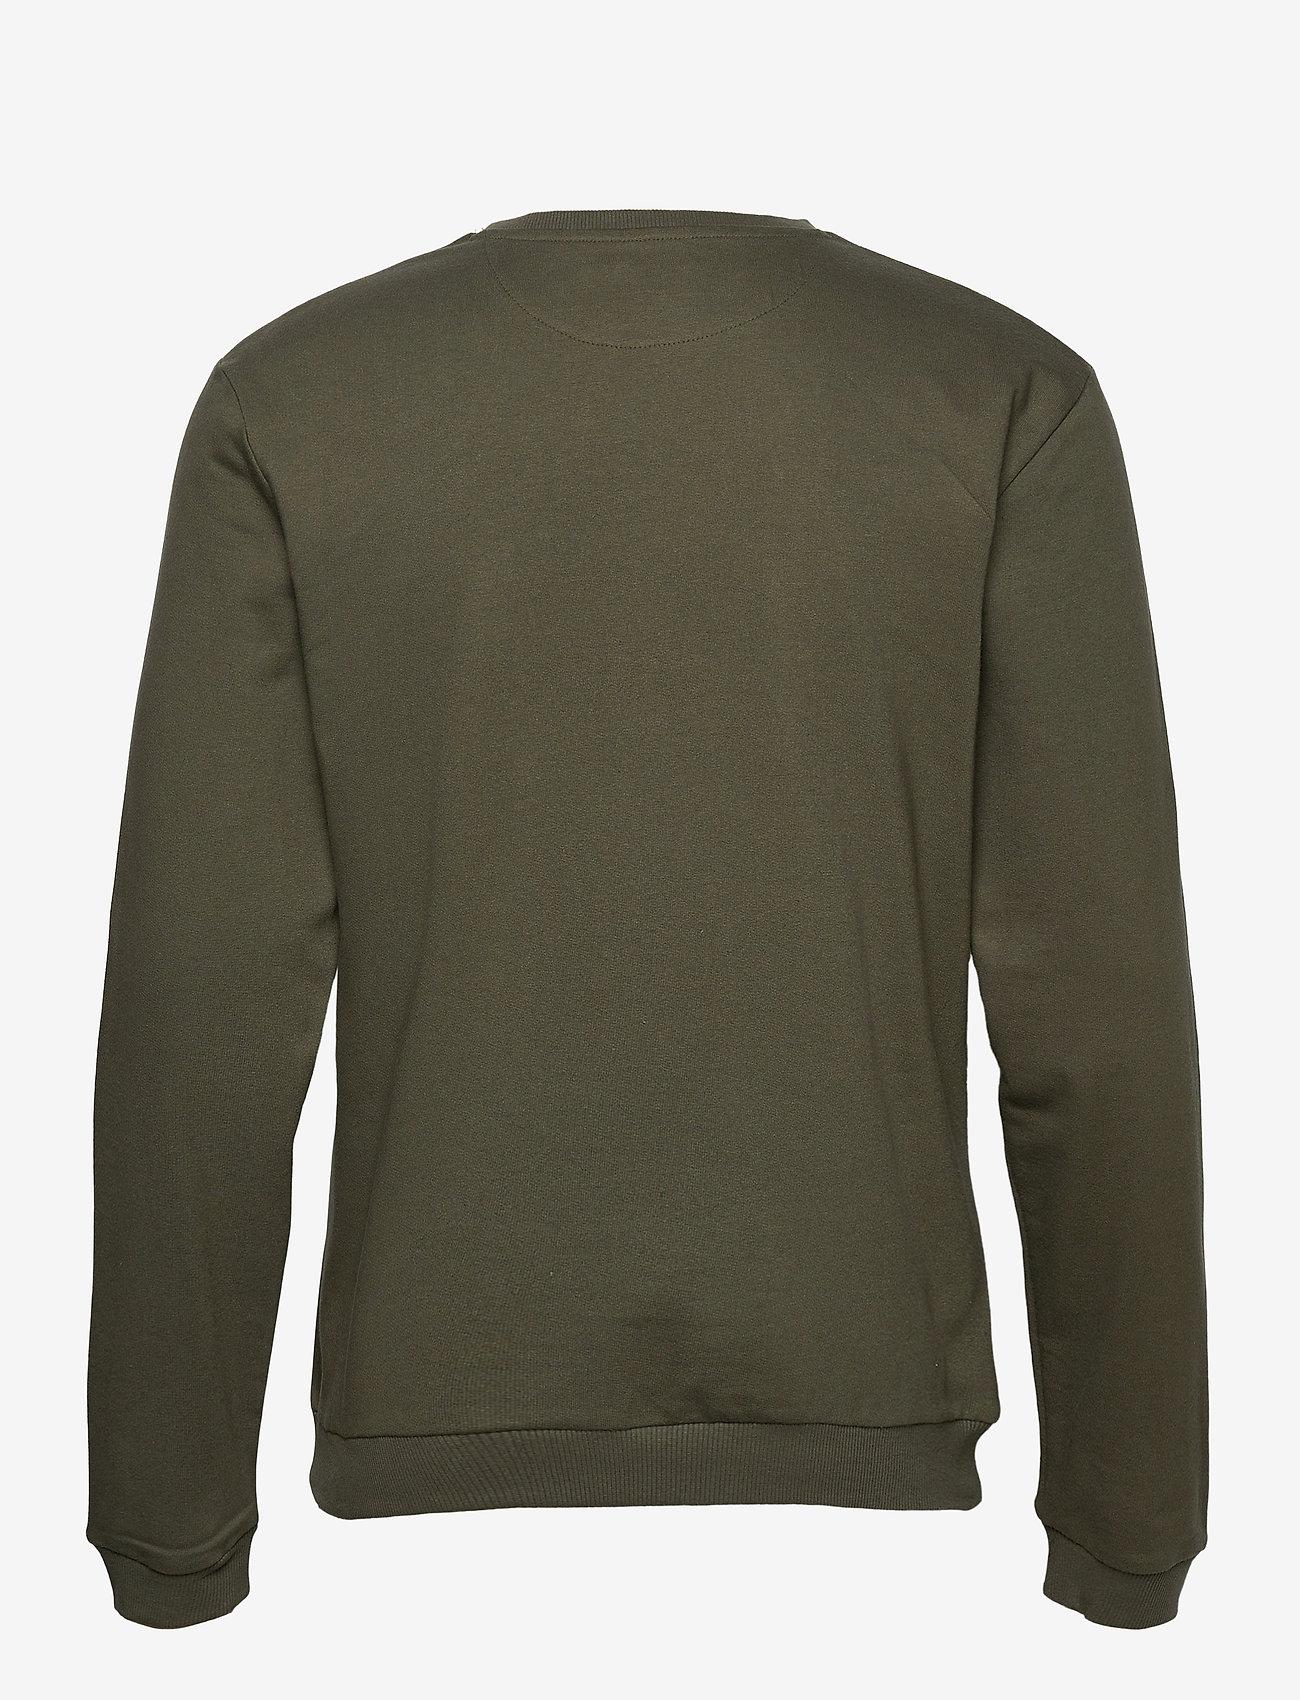 Bread & Boxers - Sweatshirt - truien - olive green - 1